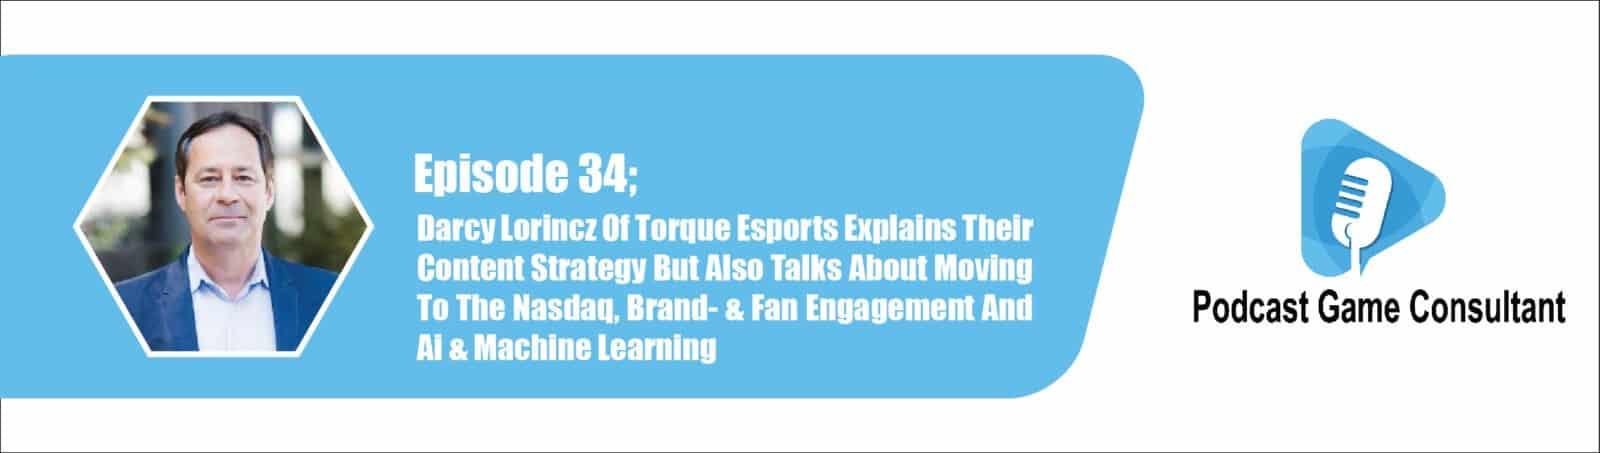 Darcy Lorincz Of Torque Esports (Engine Media) Explains Their Content Strategy